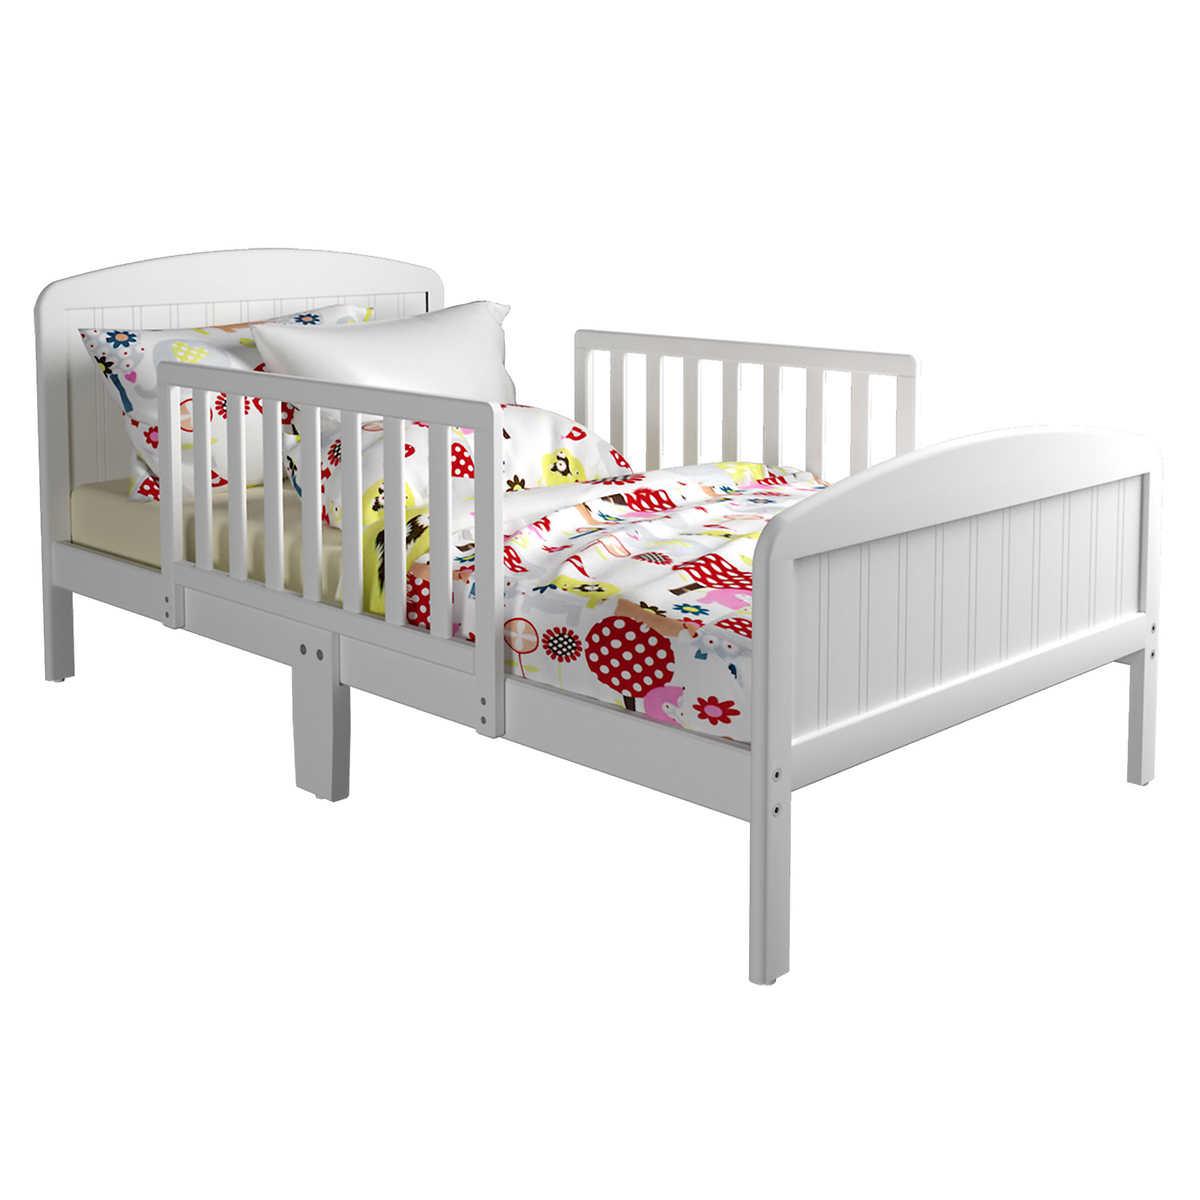 Baby cribs kijiji calgary - Harrisburg Toddler Bed Warm White